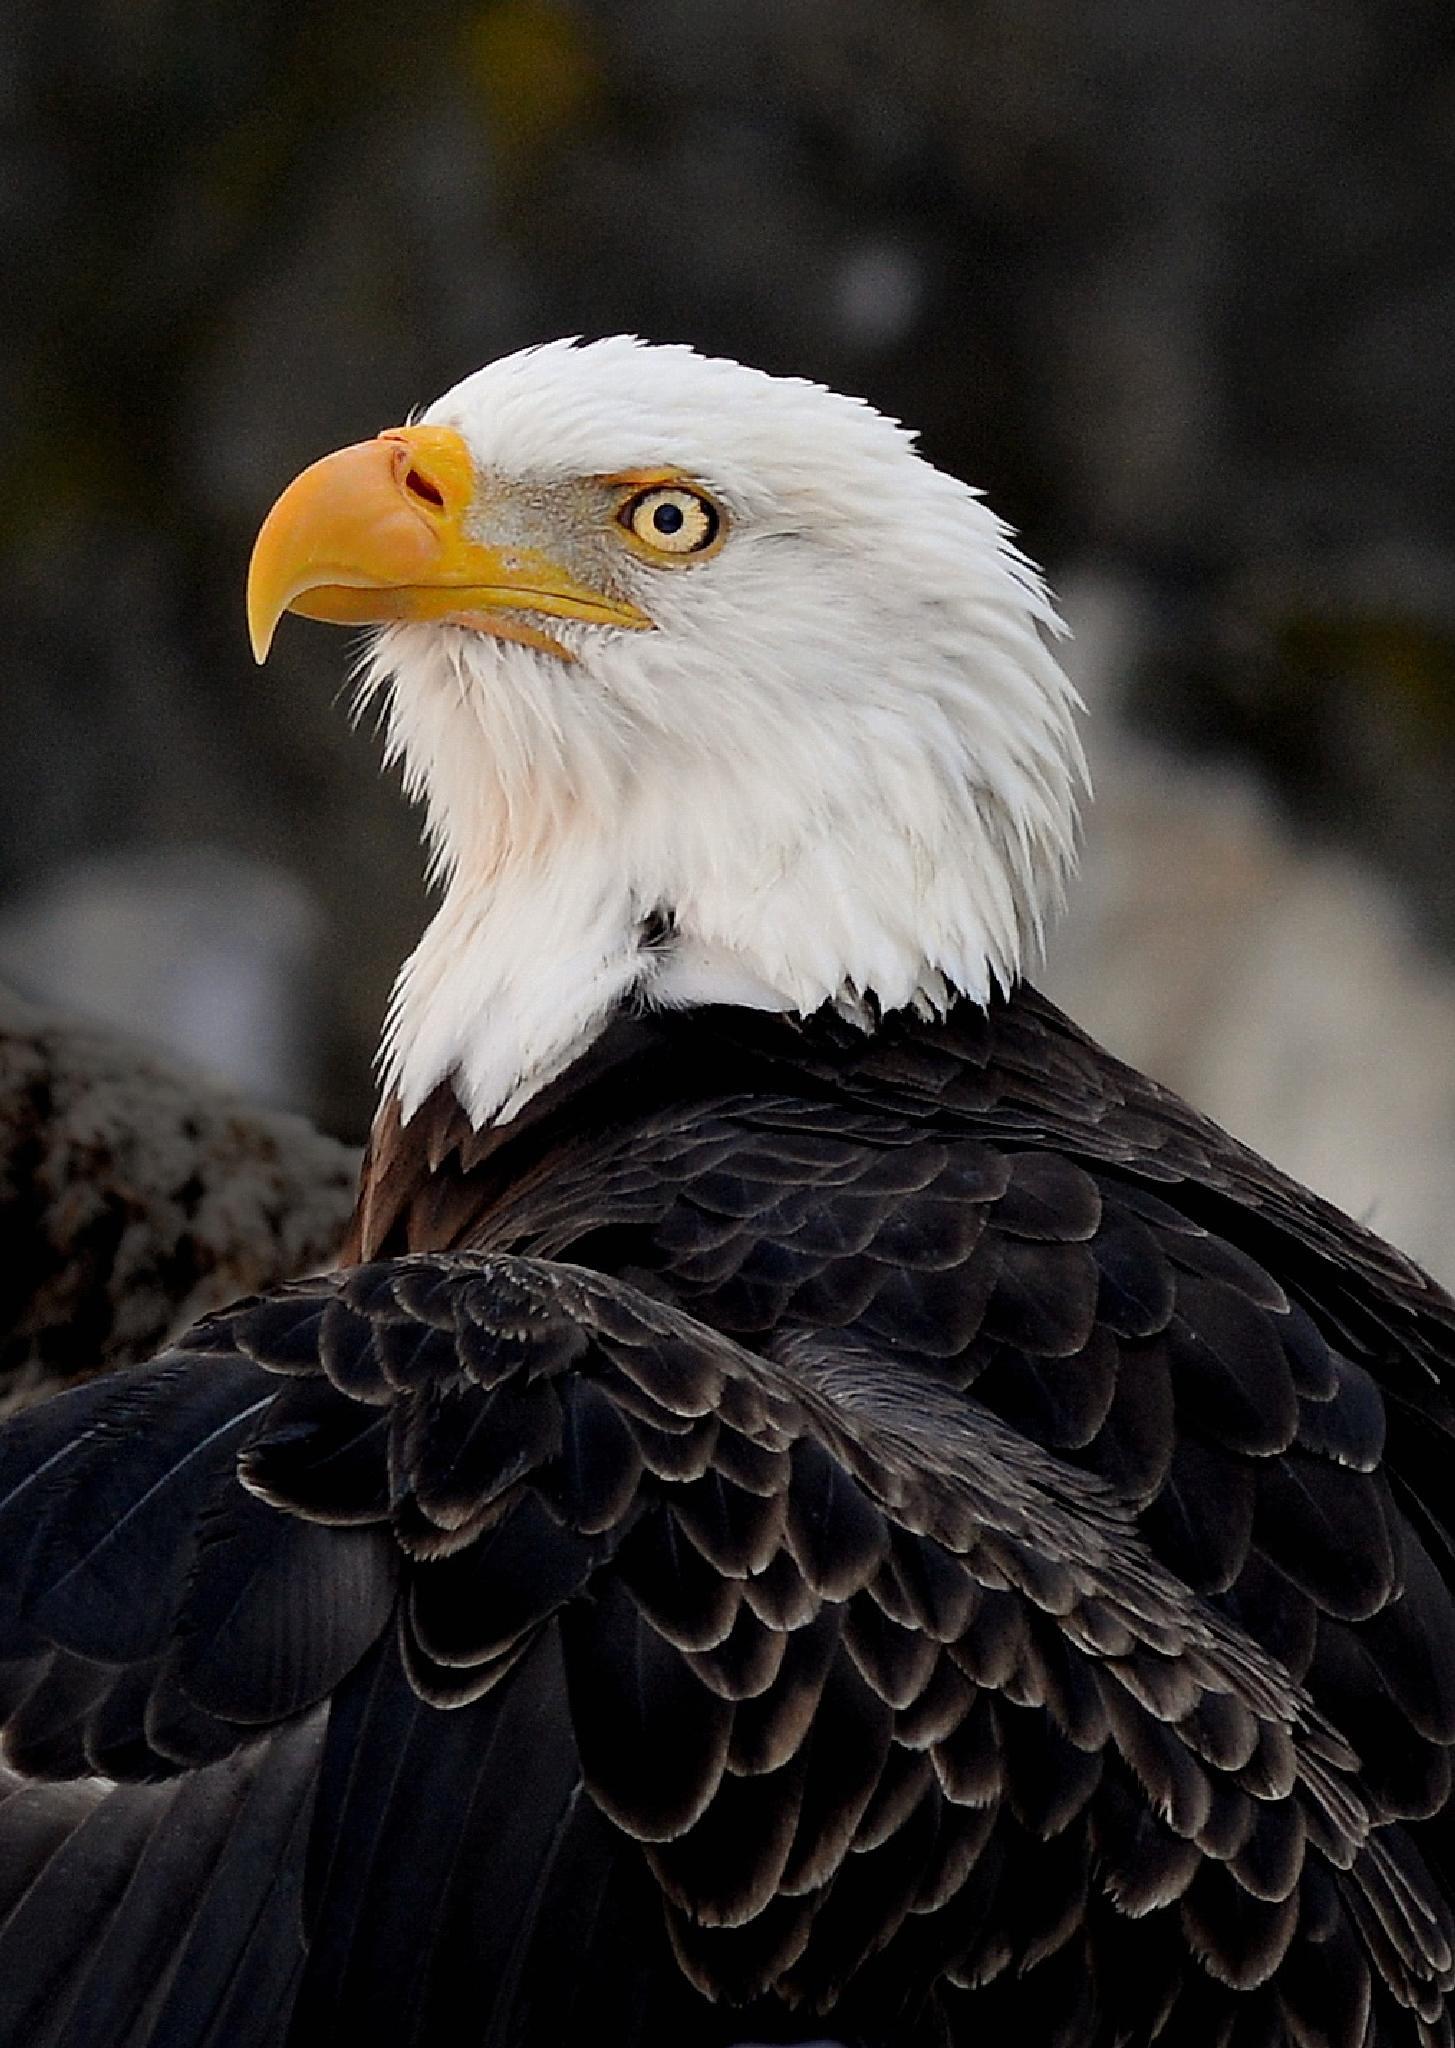 eagle eye by Jeff Fox